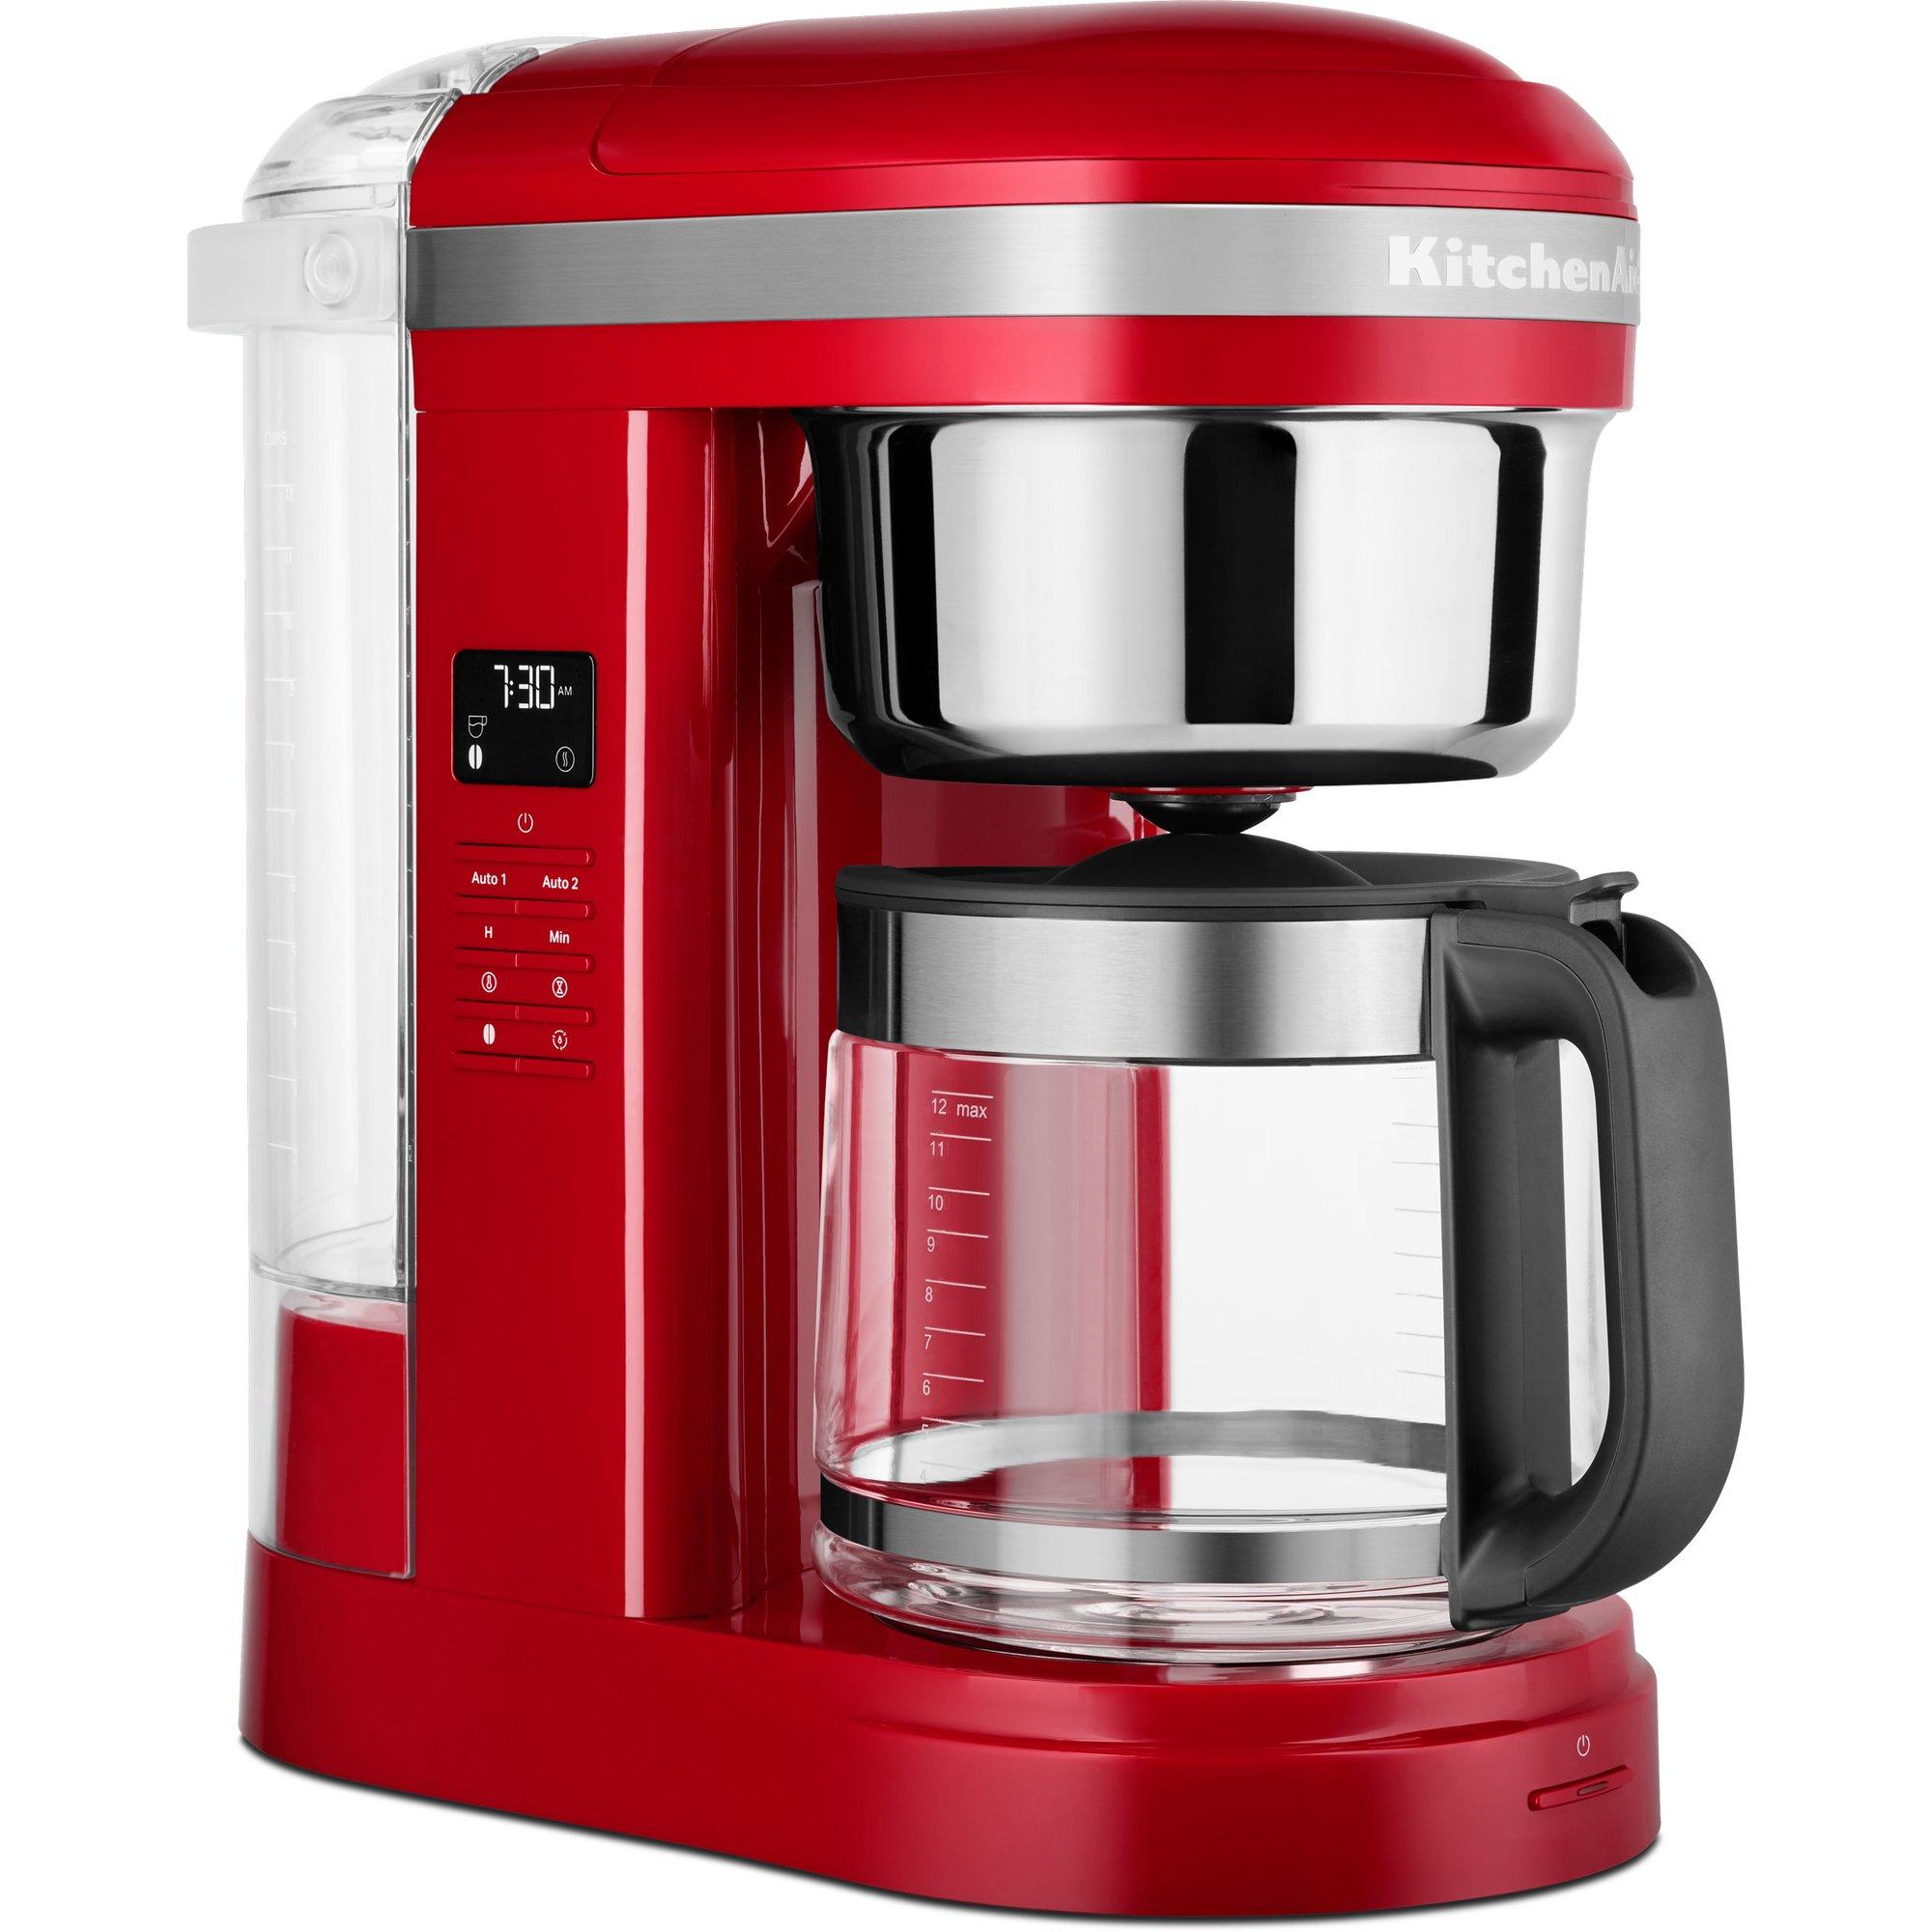 KitchenAid 5KCM1209EER kaffebryggare Empire Red